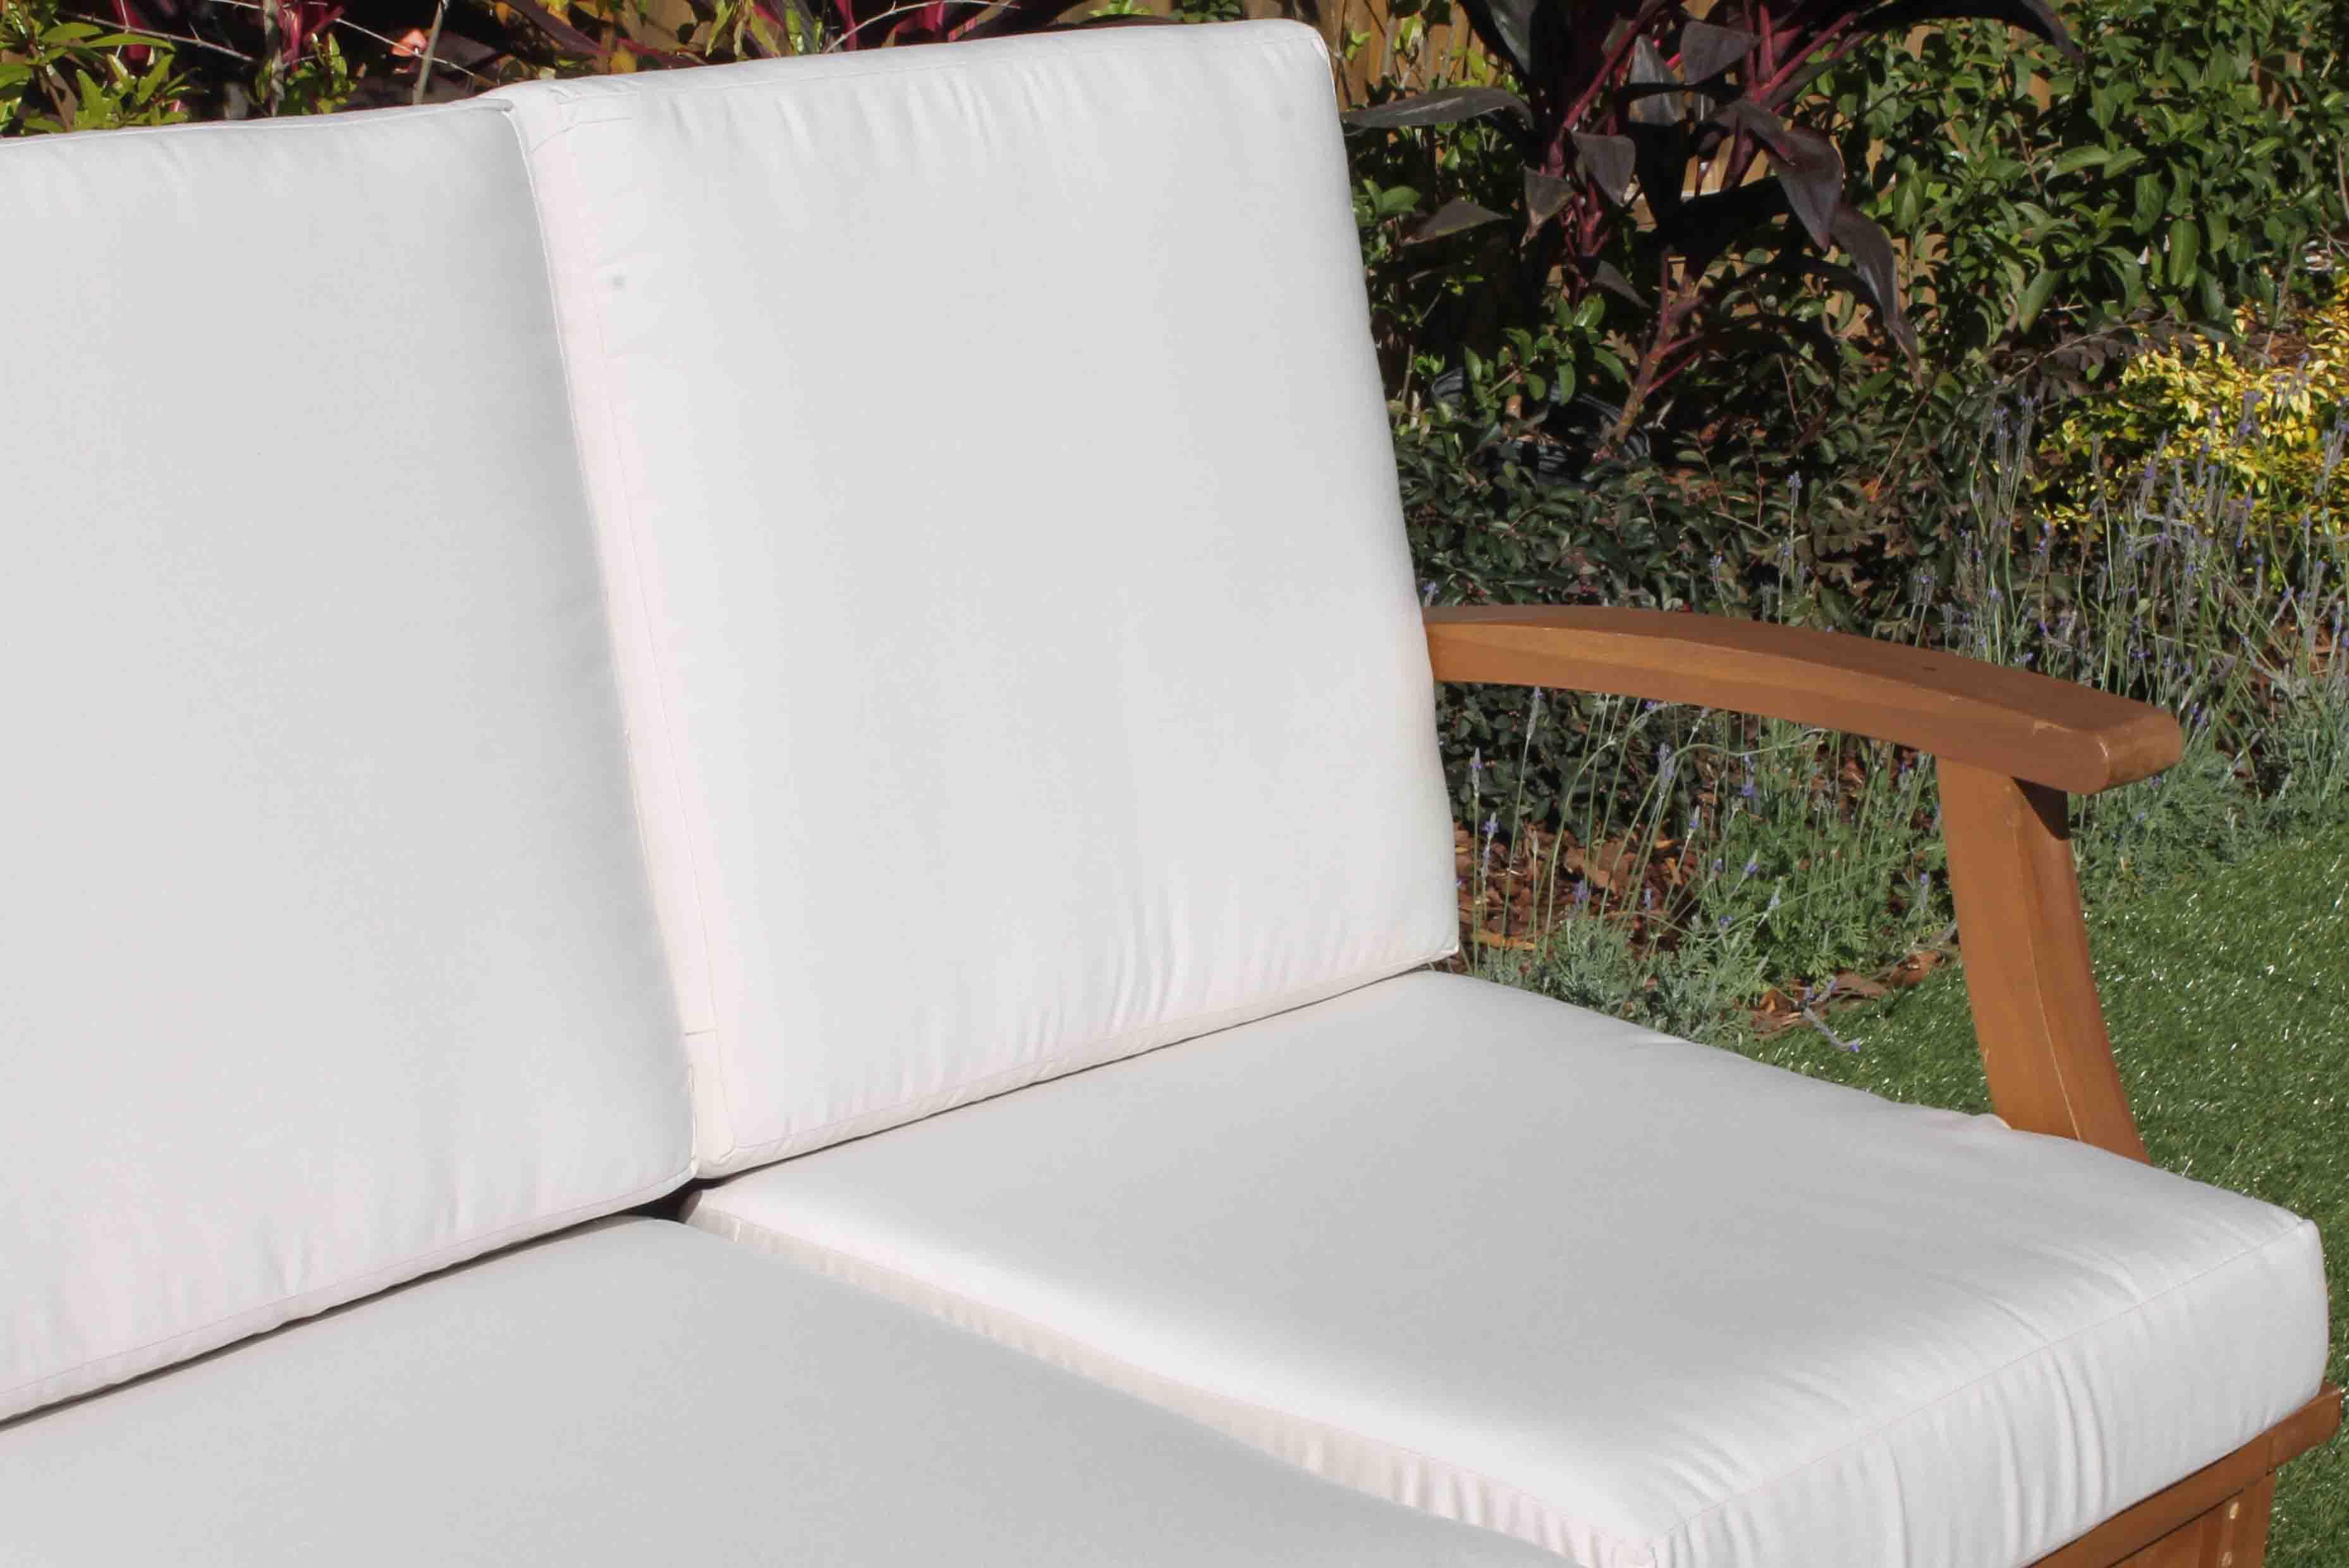 Deep Seat Teak Set – 5 Seat including Full Sunbrella Cushions